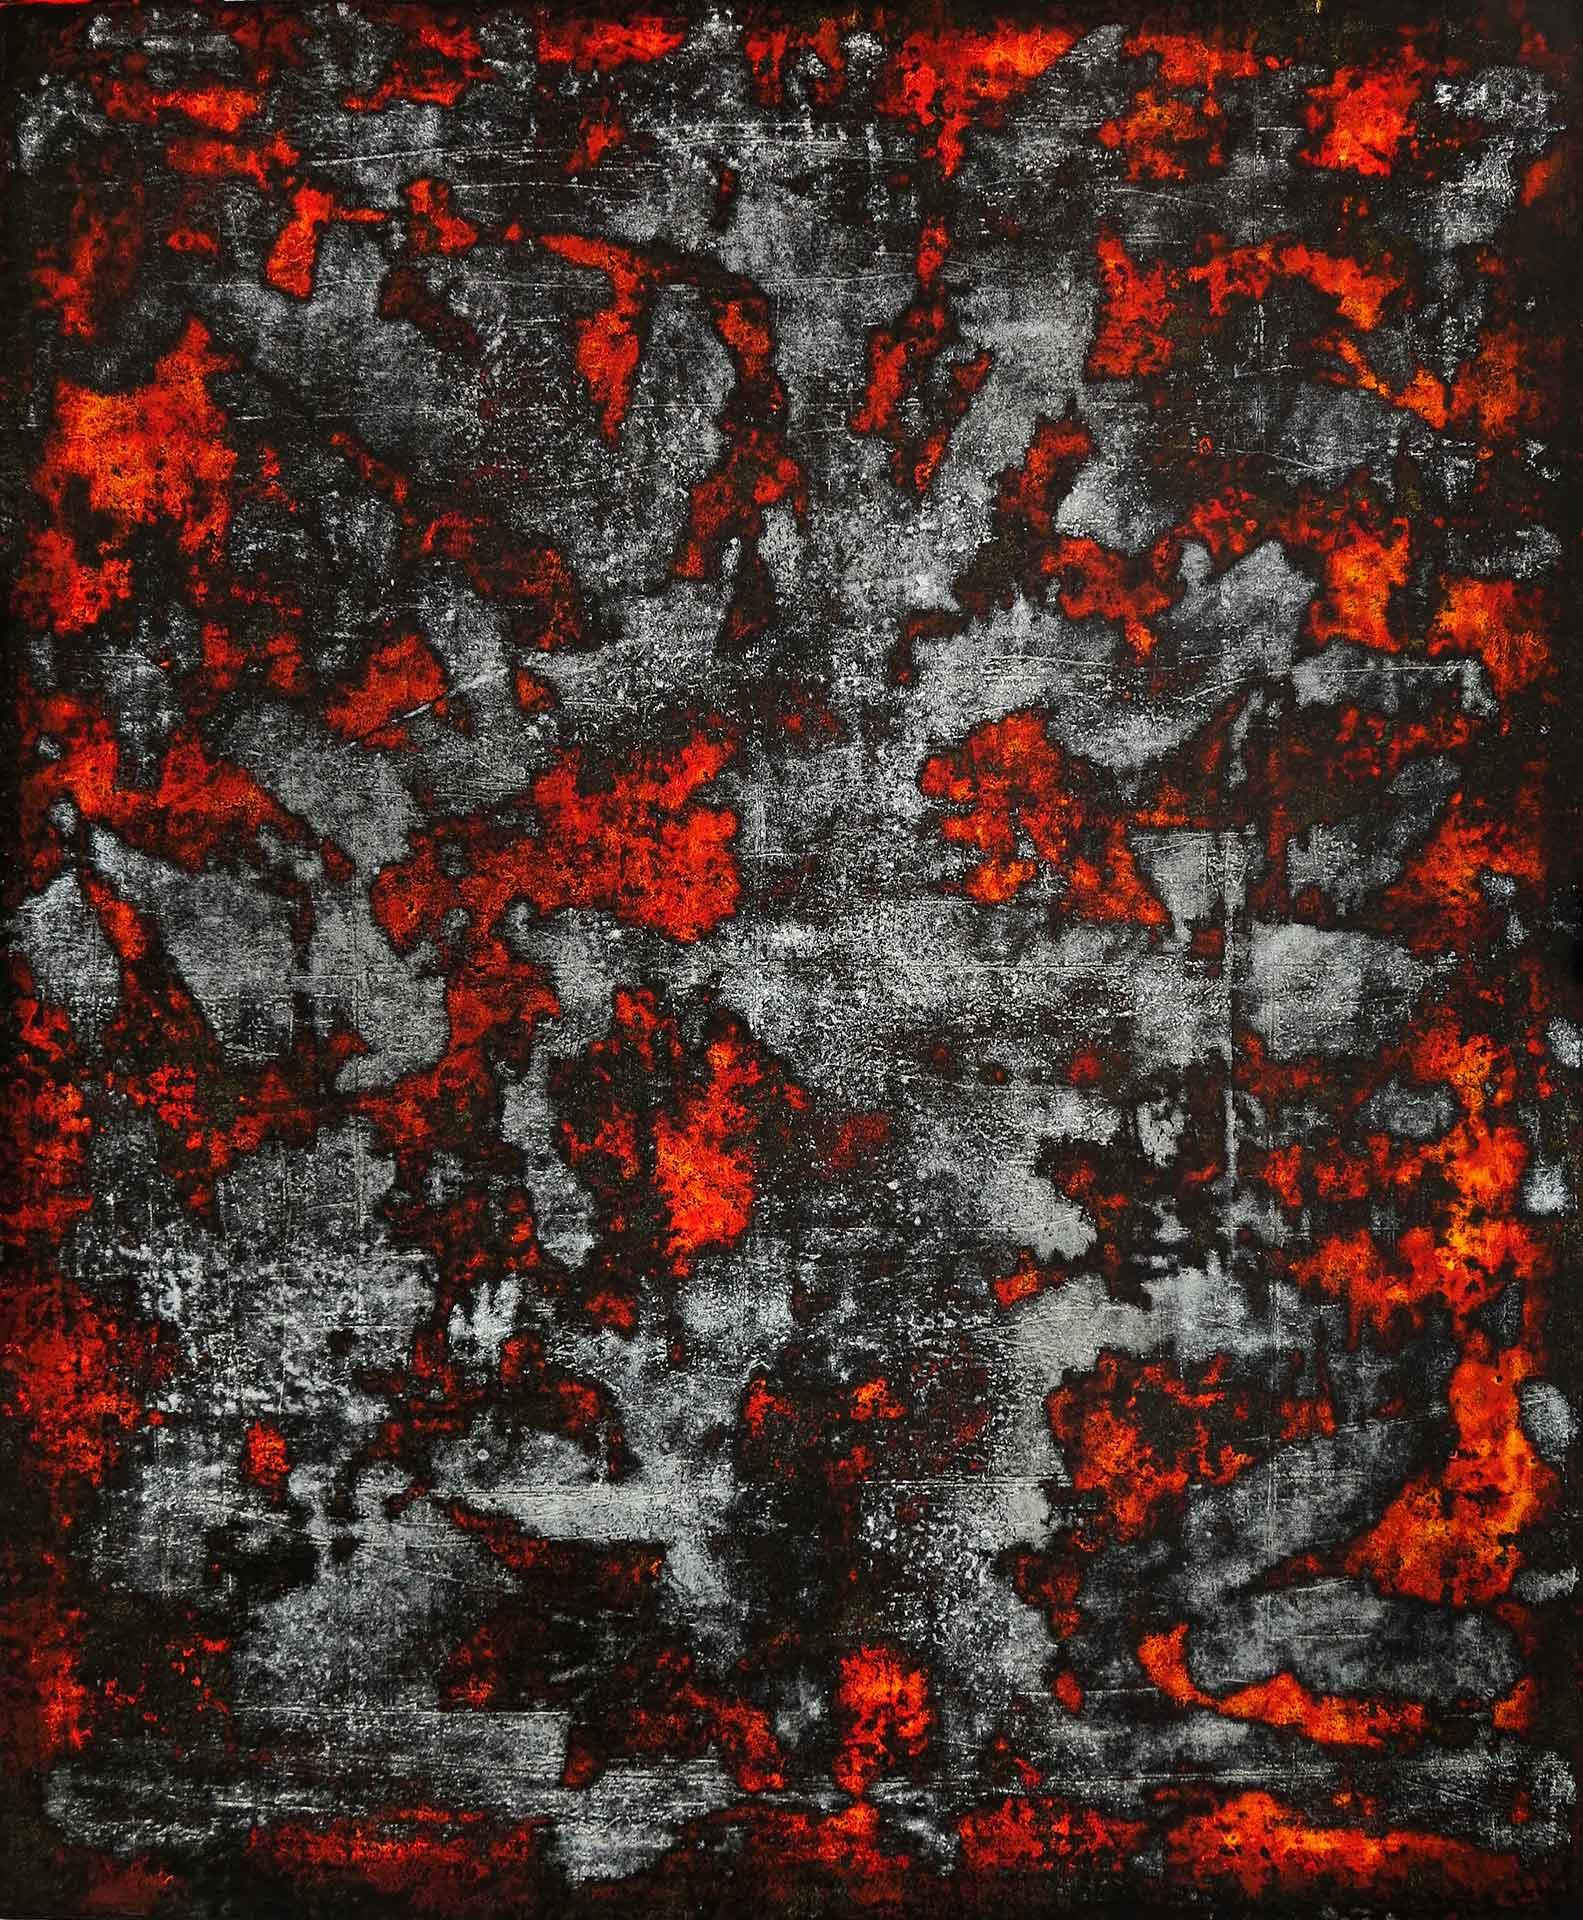 Tuval üzeri akrilik – Acrylic on canvas 120*100 cm